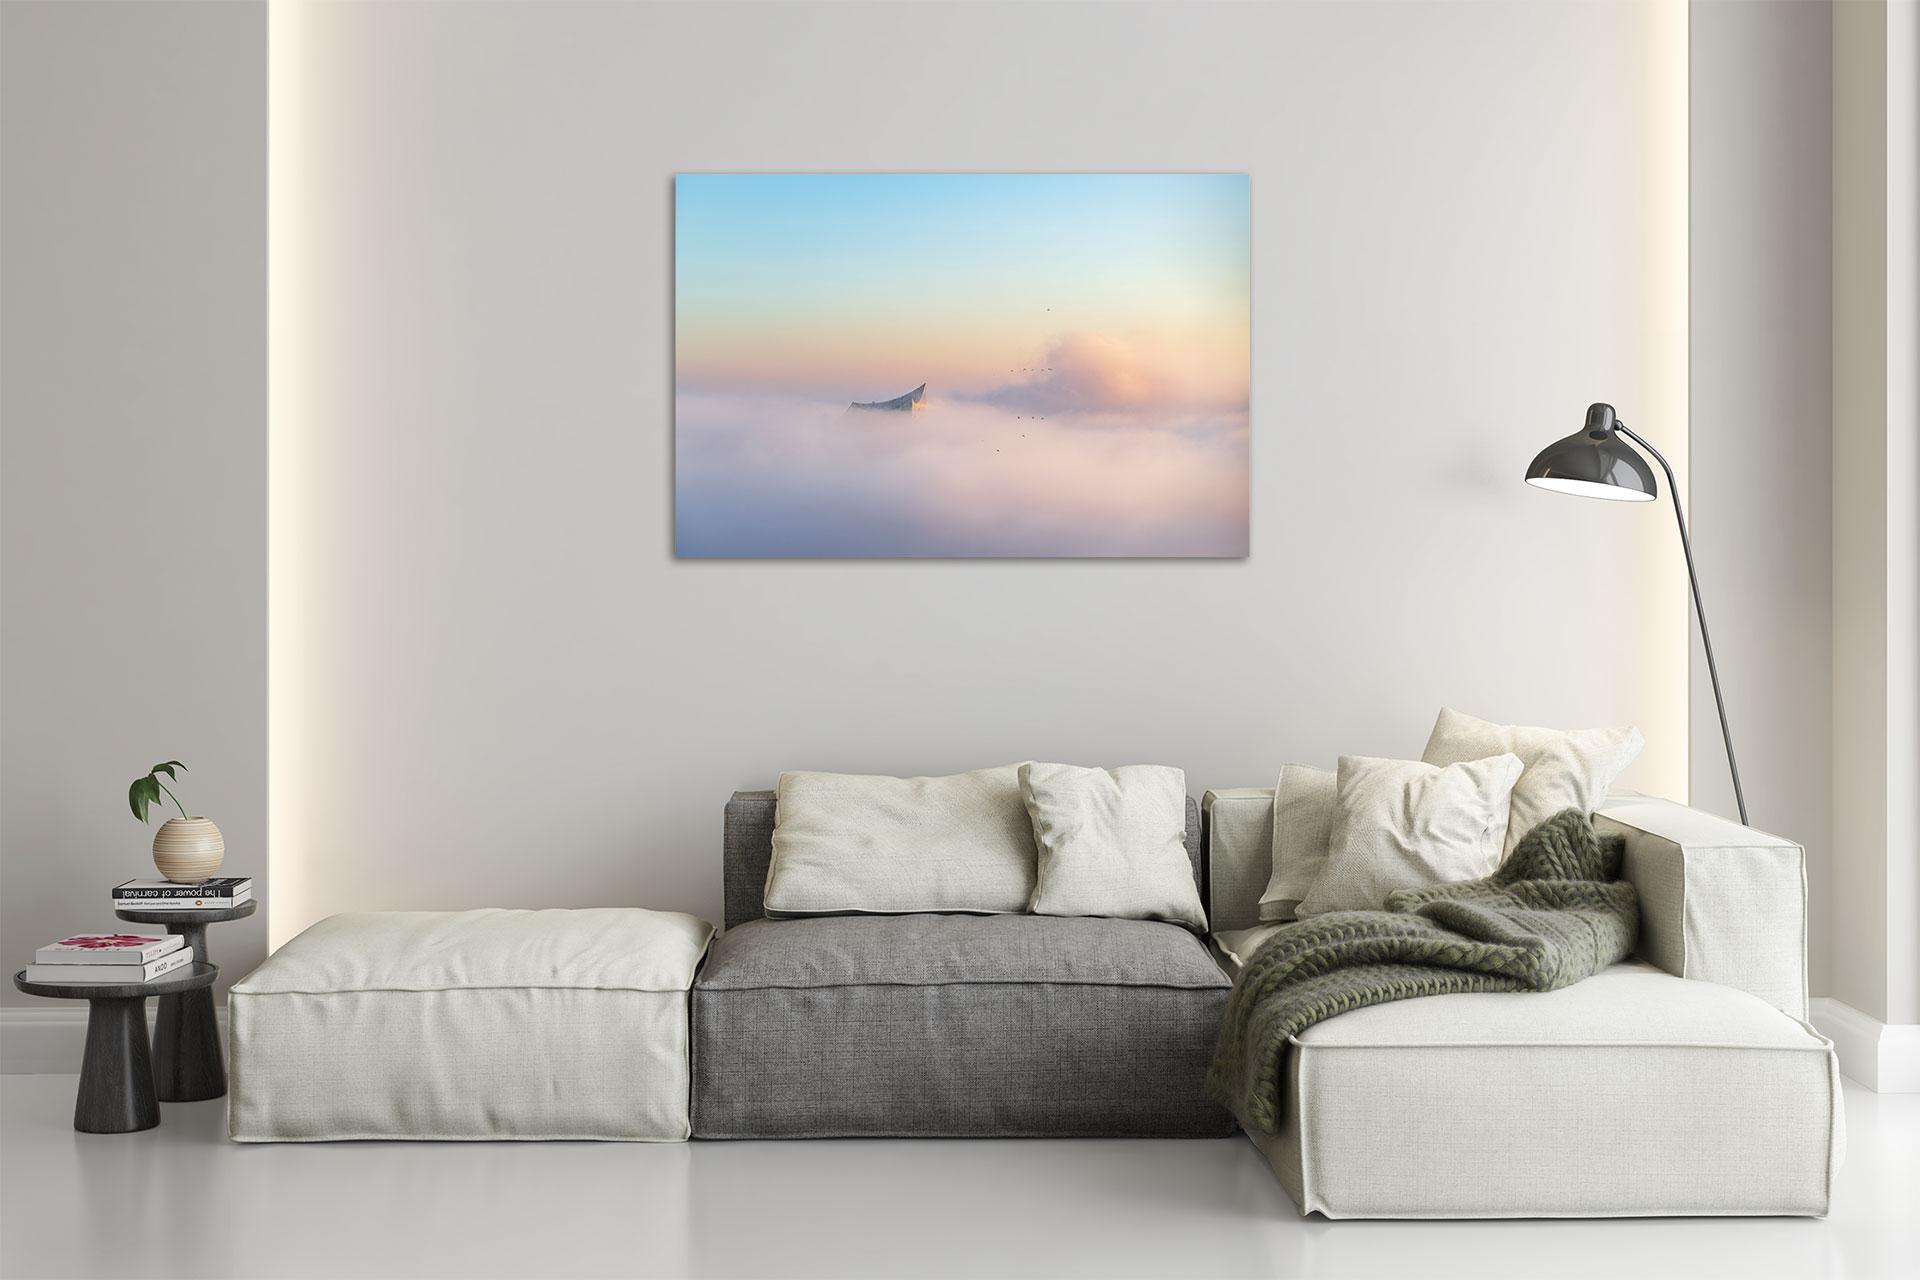 Hamburg Elbphilharmonie im Nebel michel und elbe Soundcloud Wandbild Dibond Leinwand Acrylglas